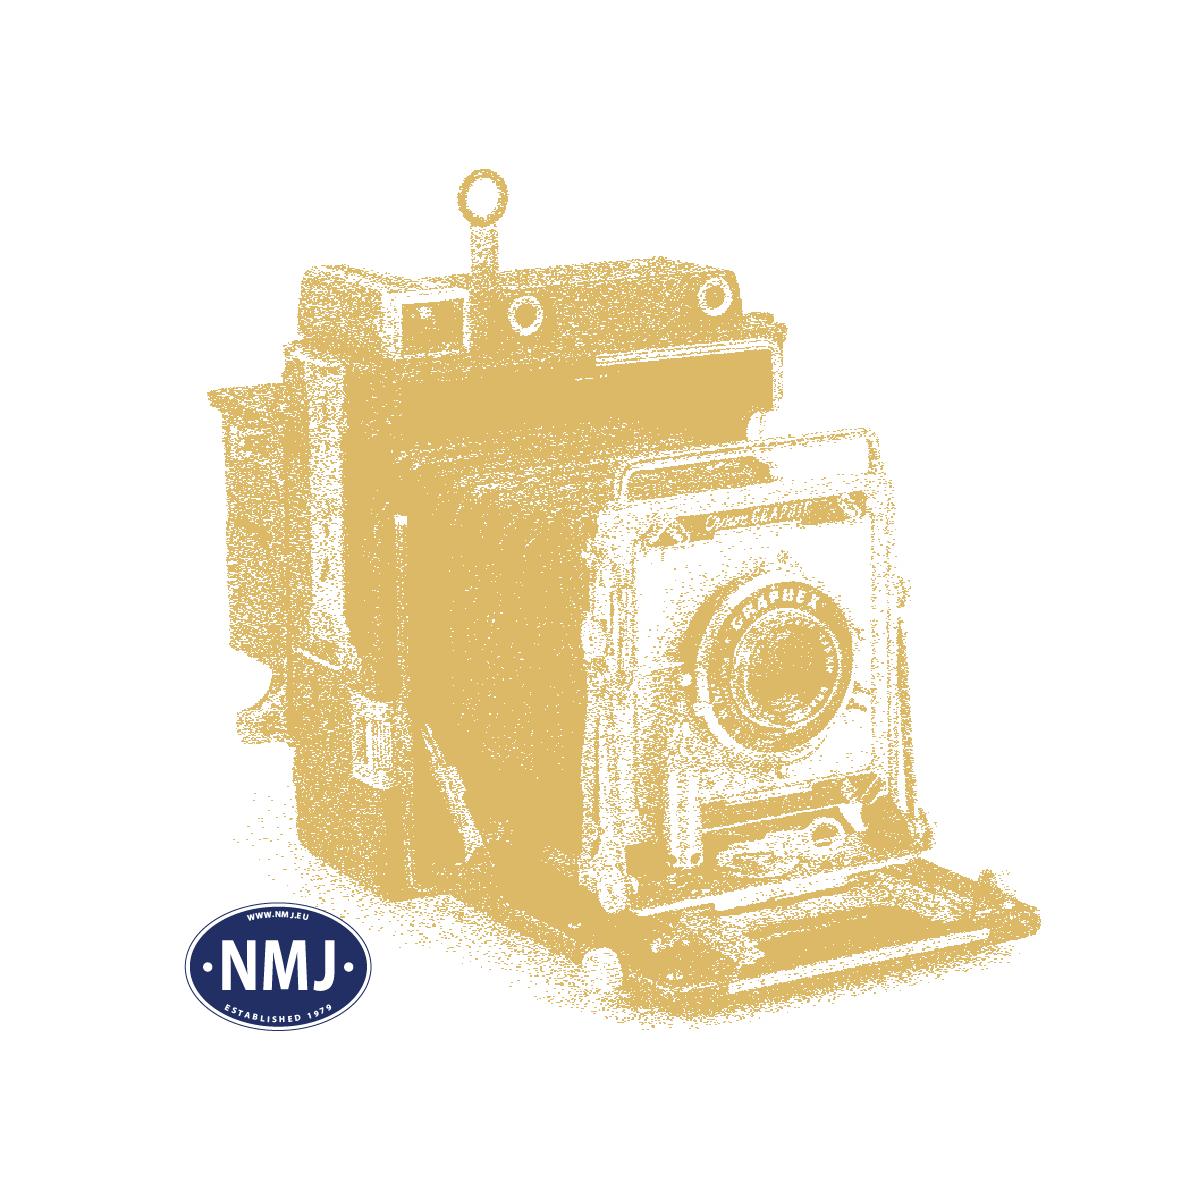 NMJT134.101 - NMJ Topline NSB DF37 21304, Gammeldesign